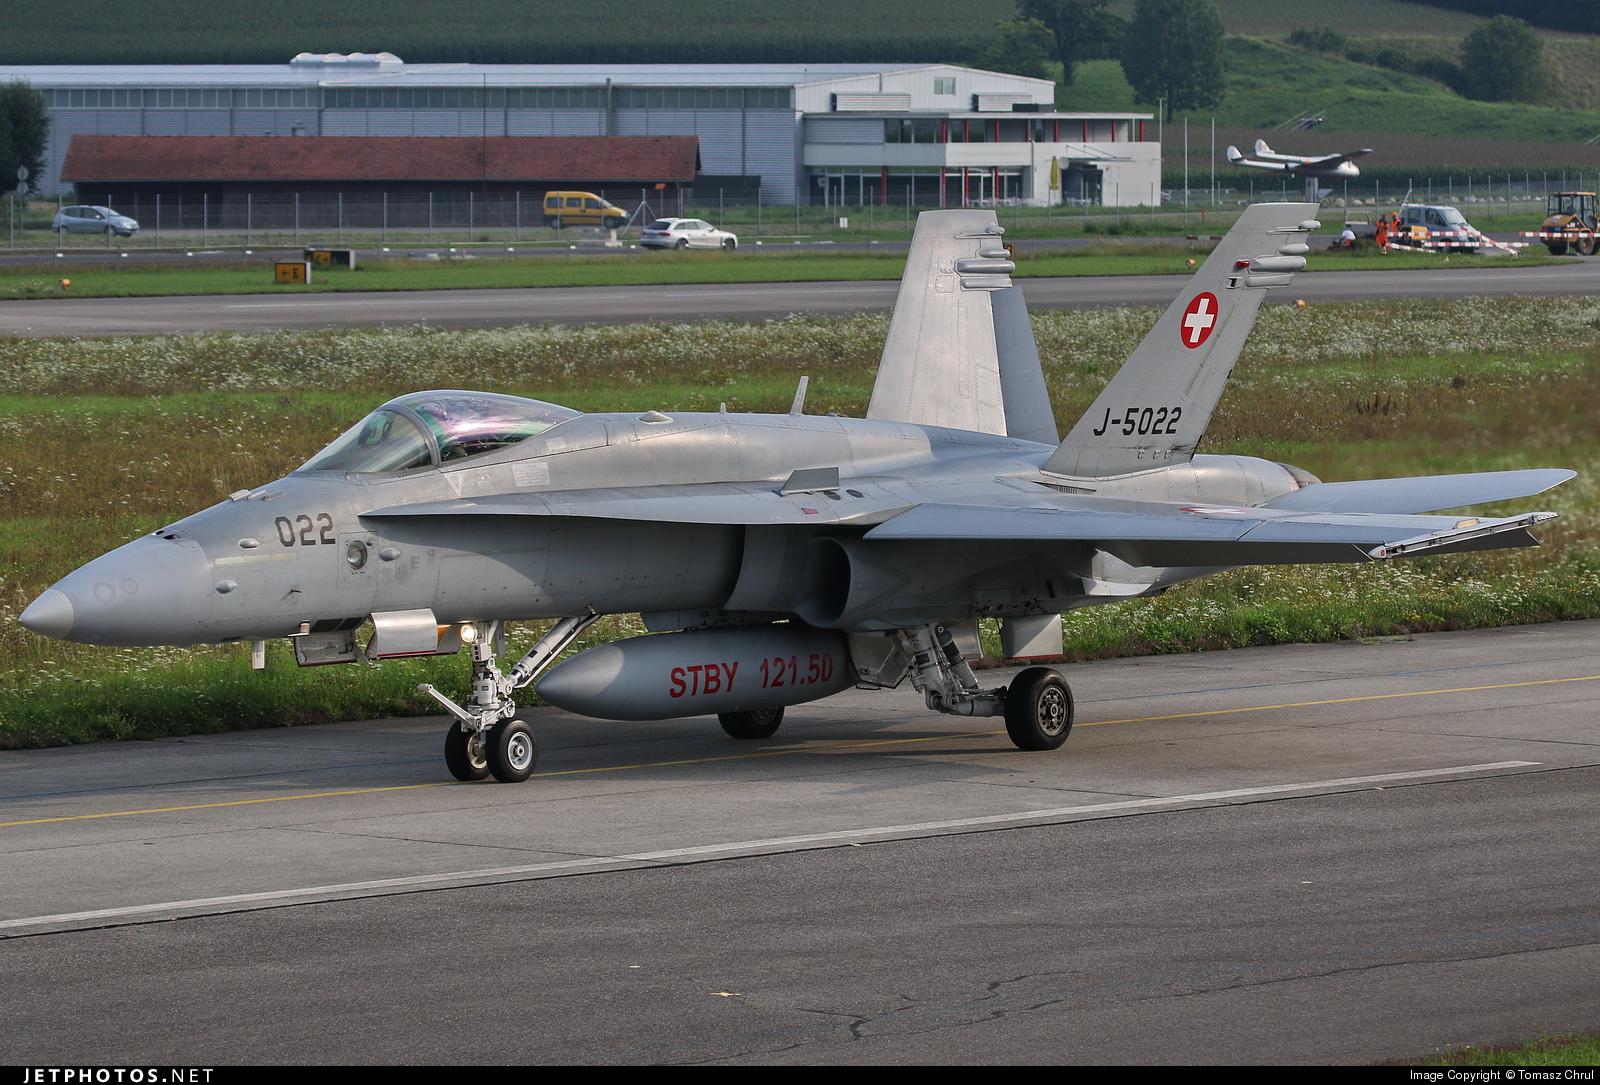 J-5022 - McDonnell Douglas F/A-18C Hornet - Switzerland - Air Force